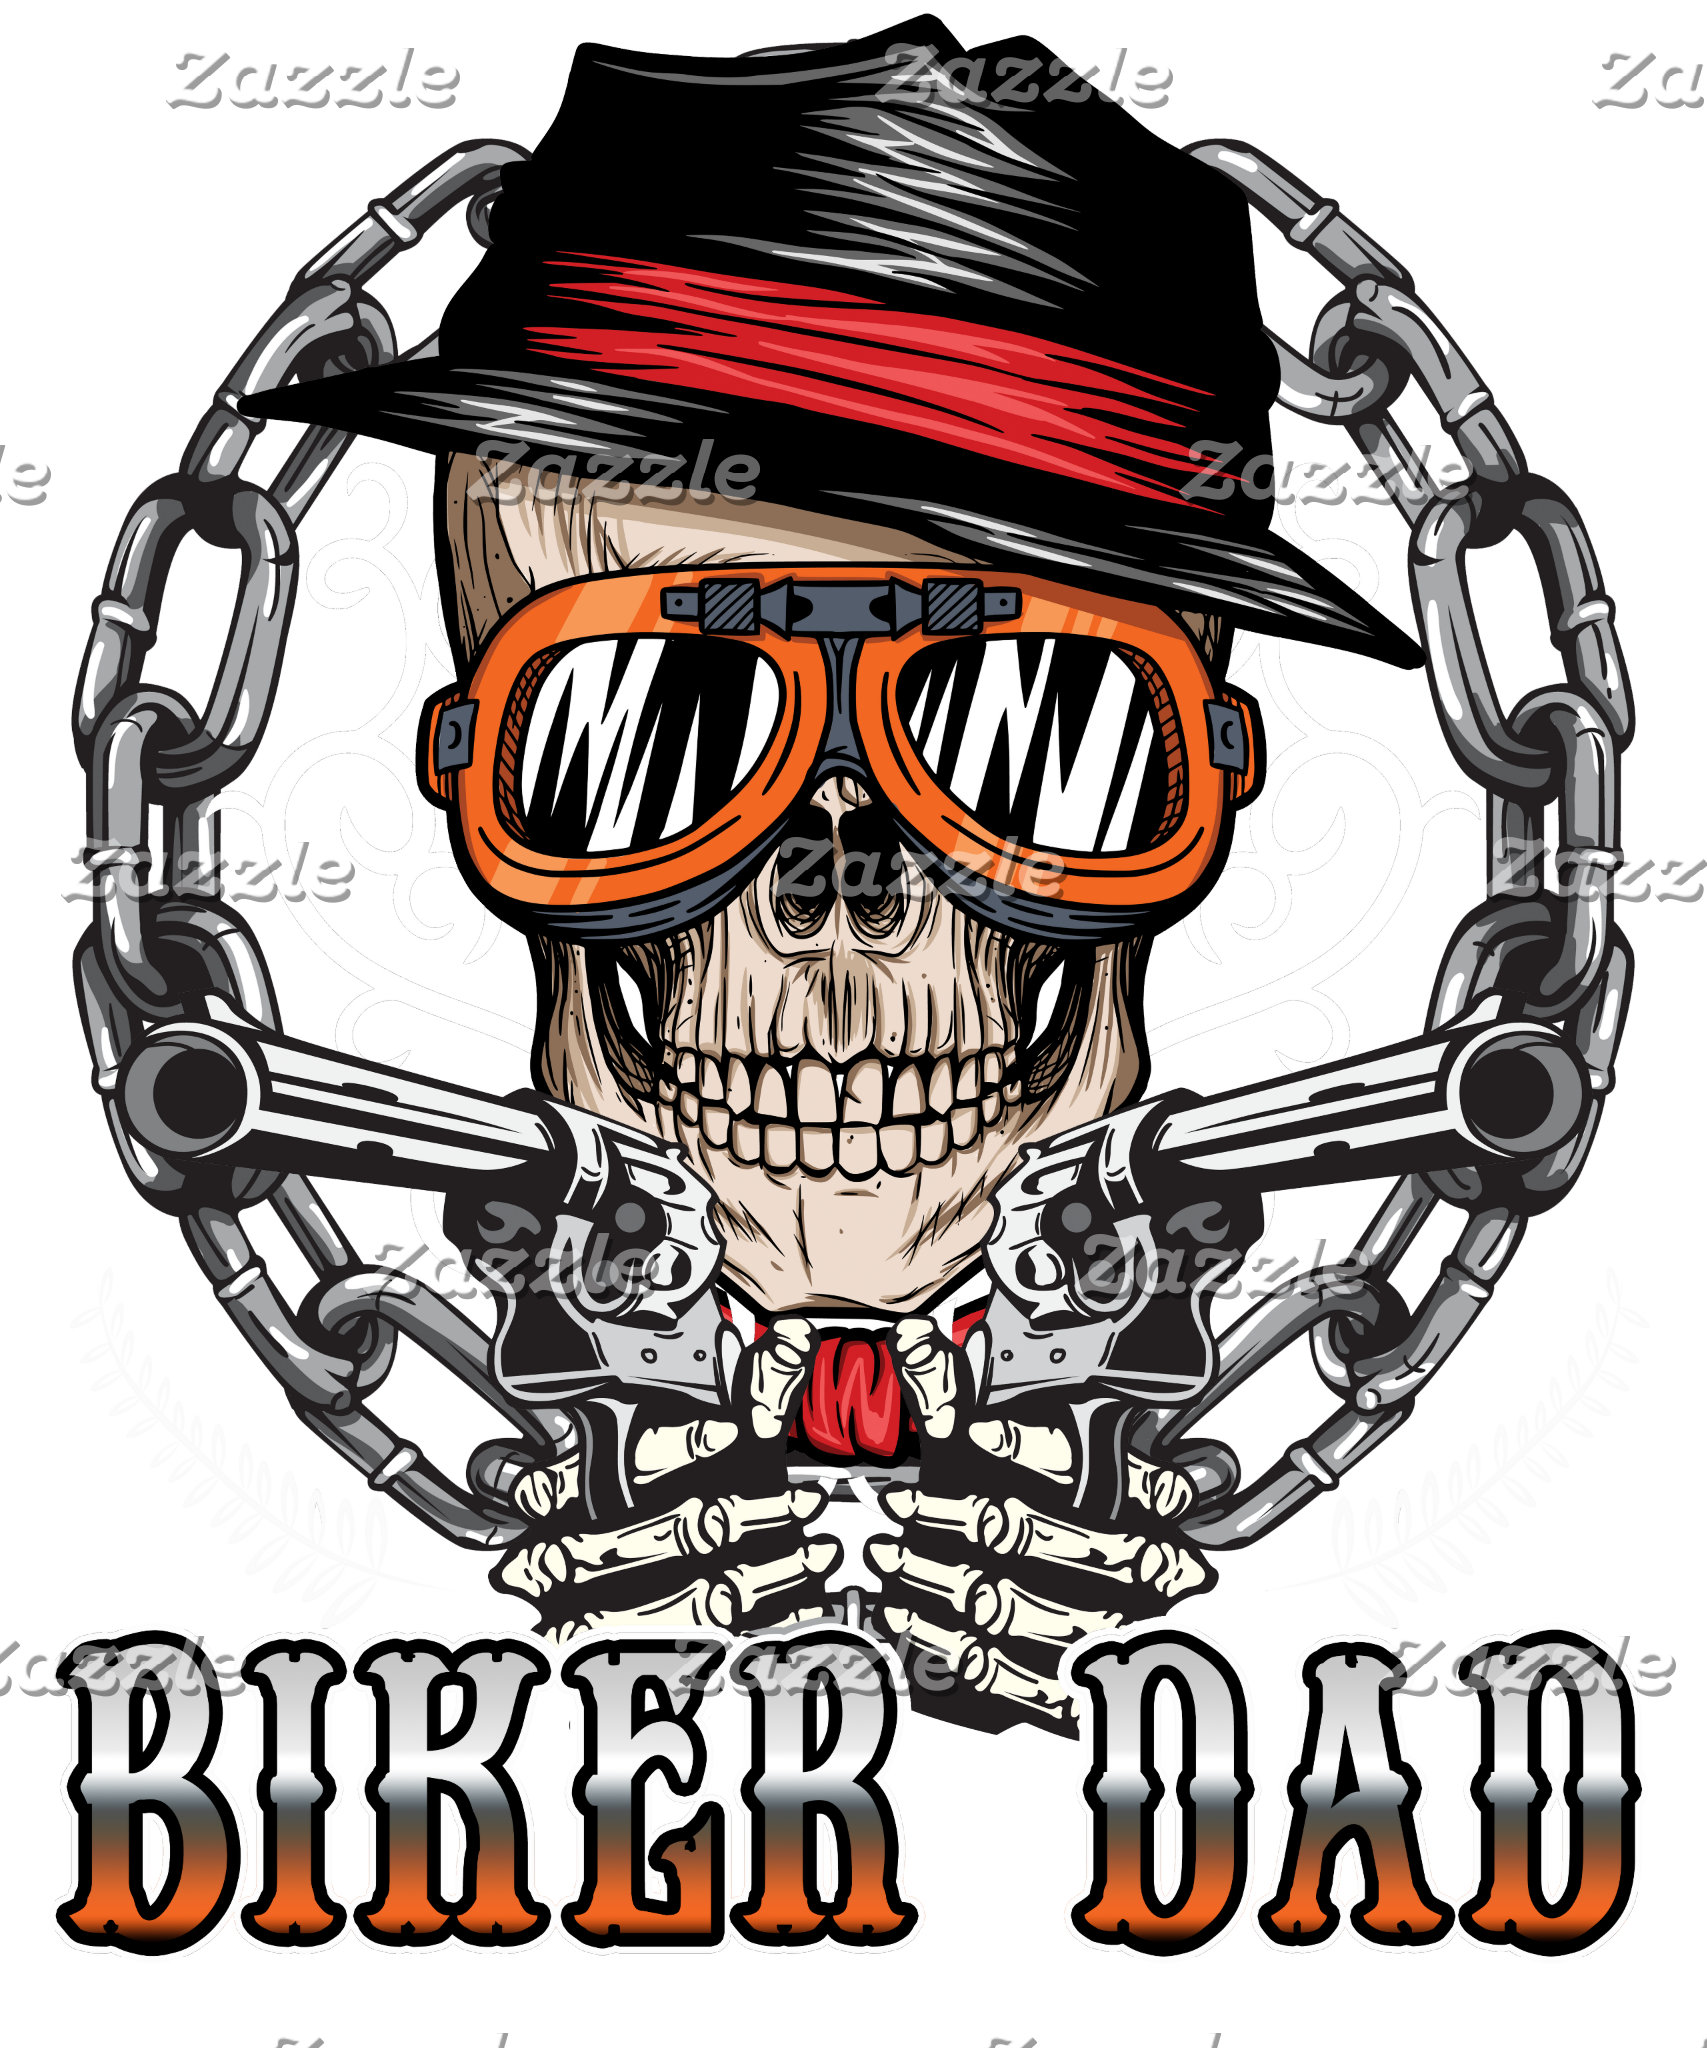 Biker Dad Skull Chain